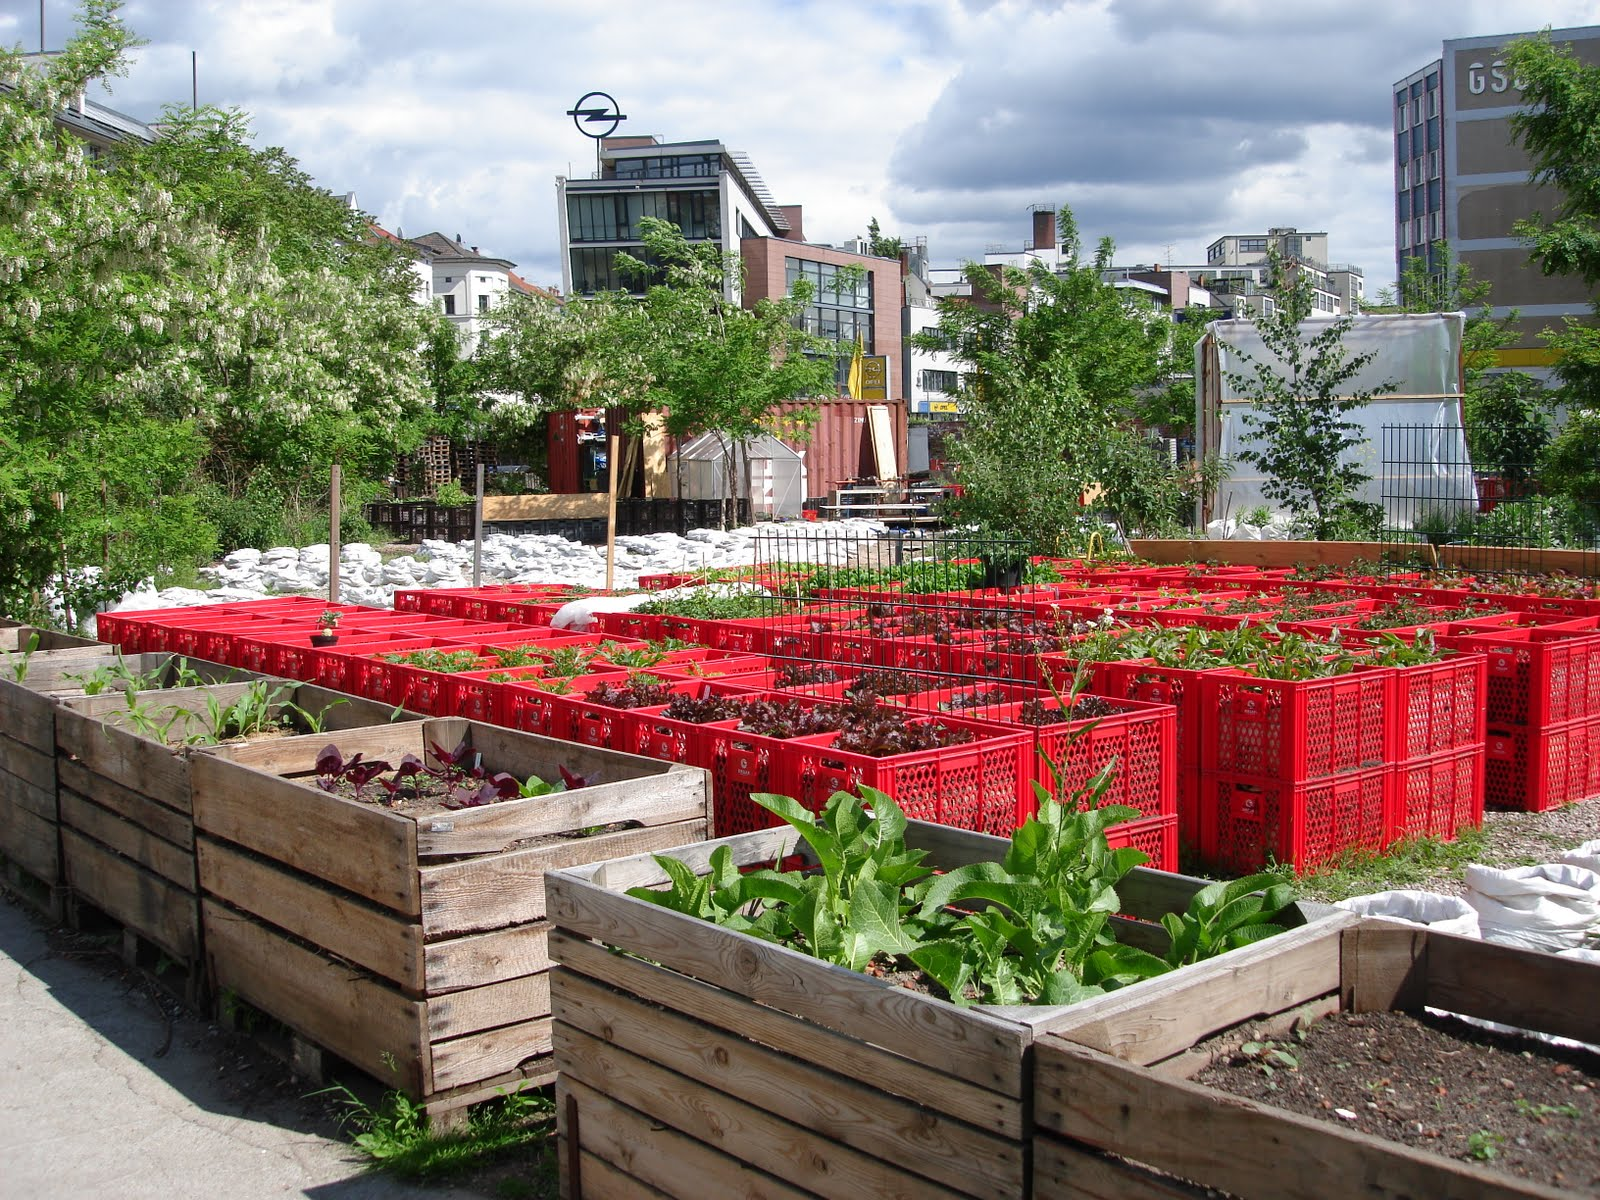 neuk lln goes country urban farming urbane. Black Bedroom Furniture Sets. Home Design Ideas